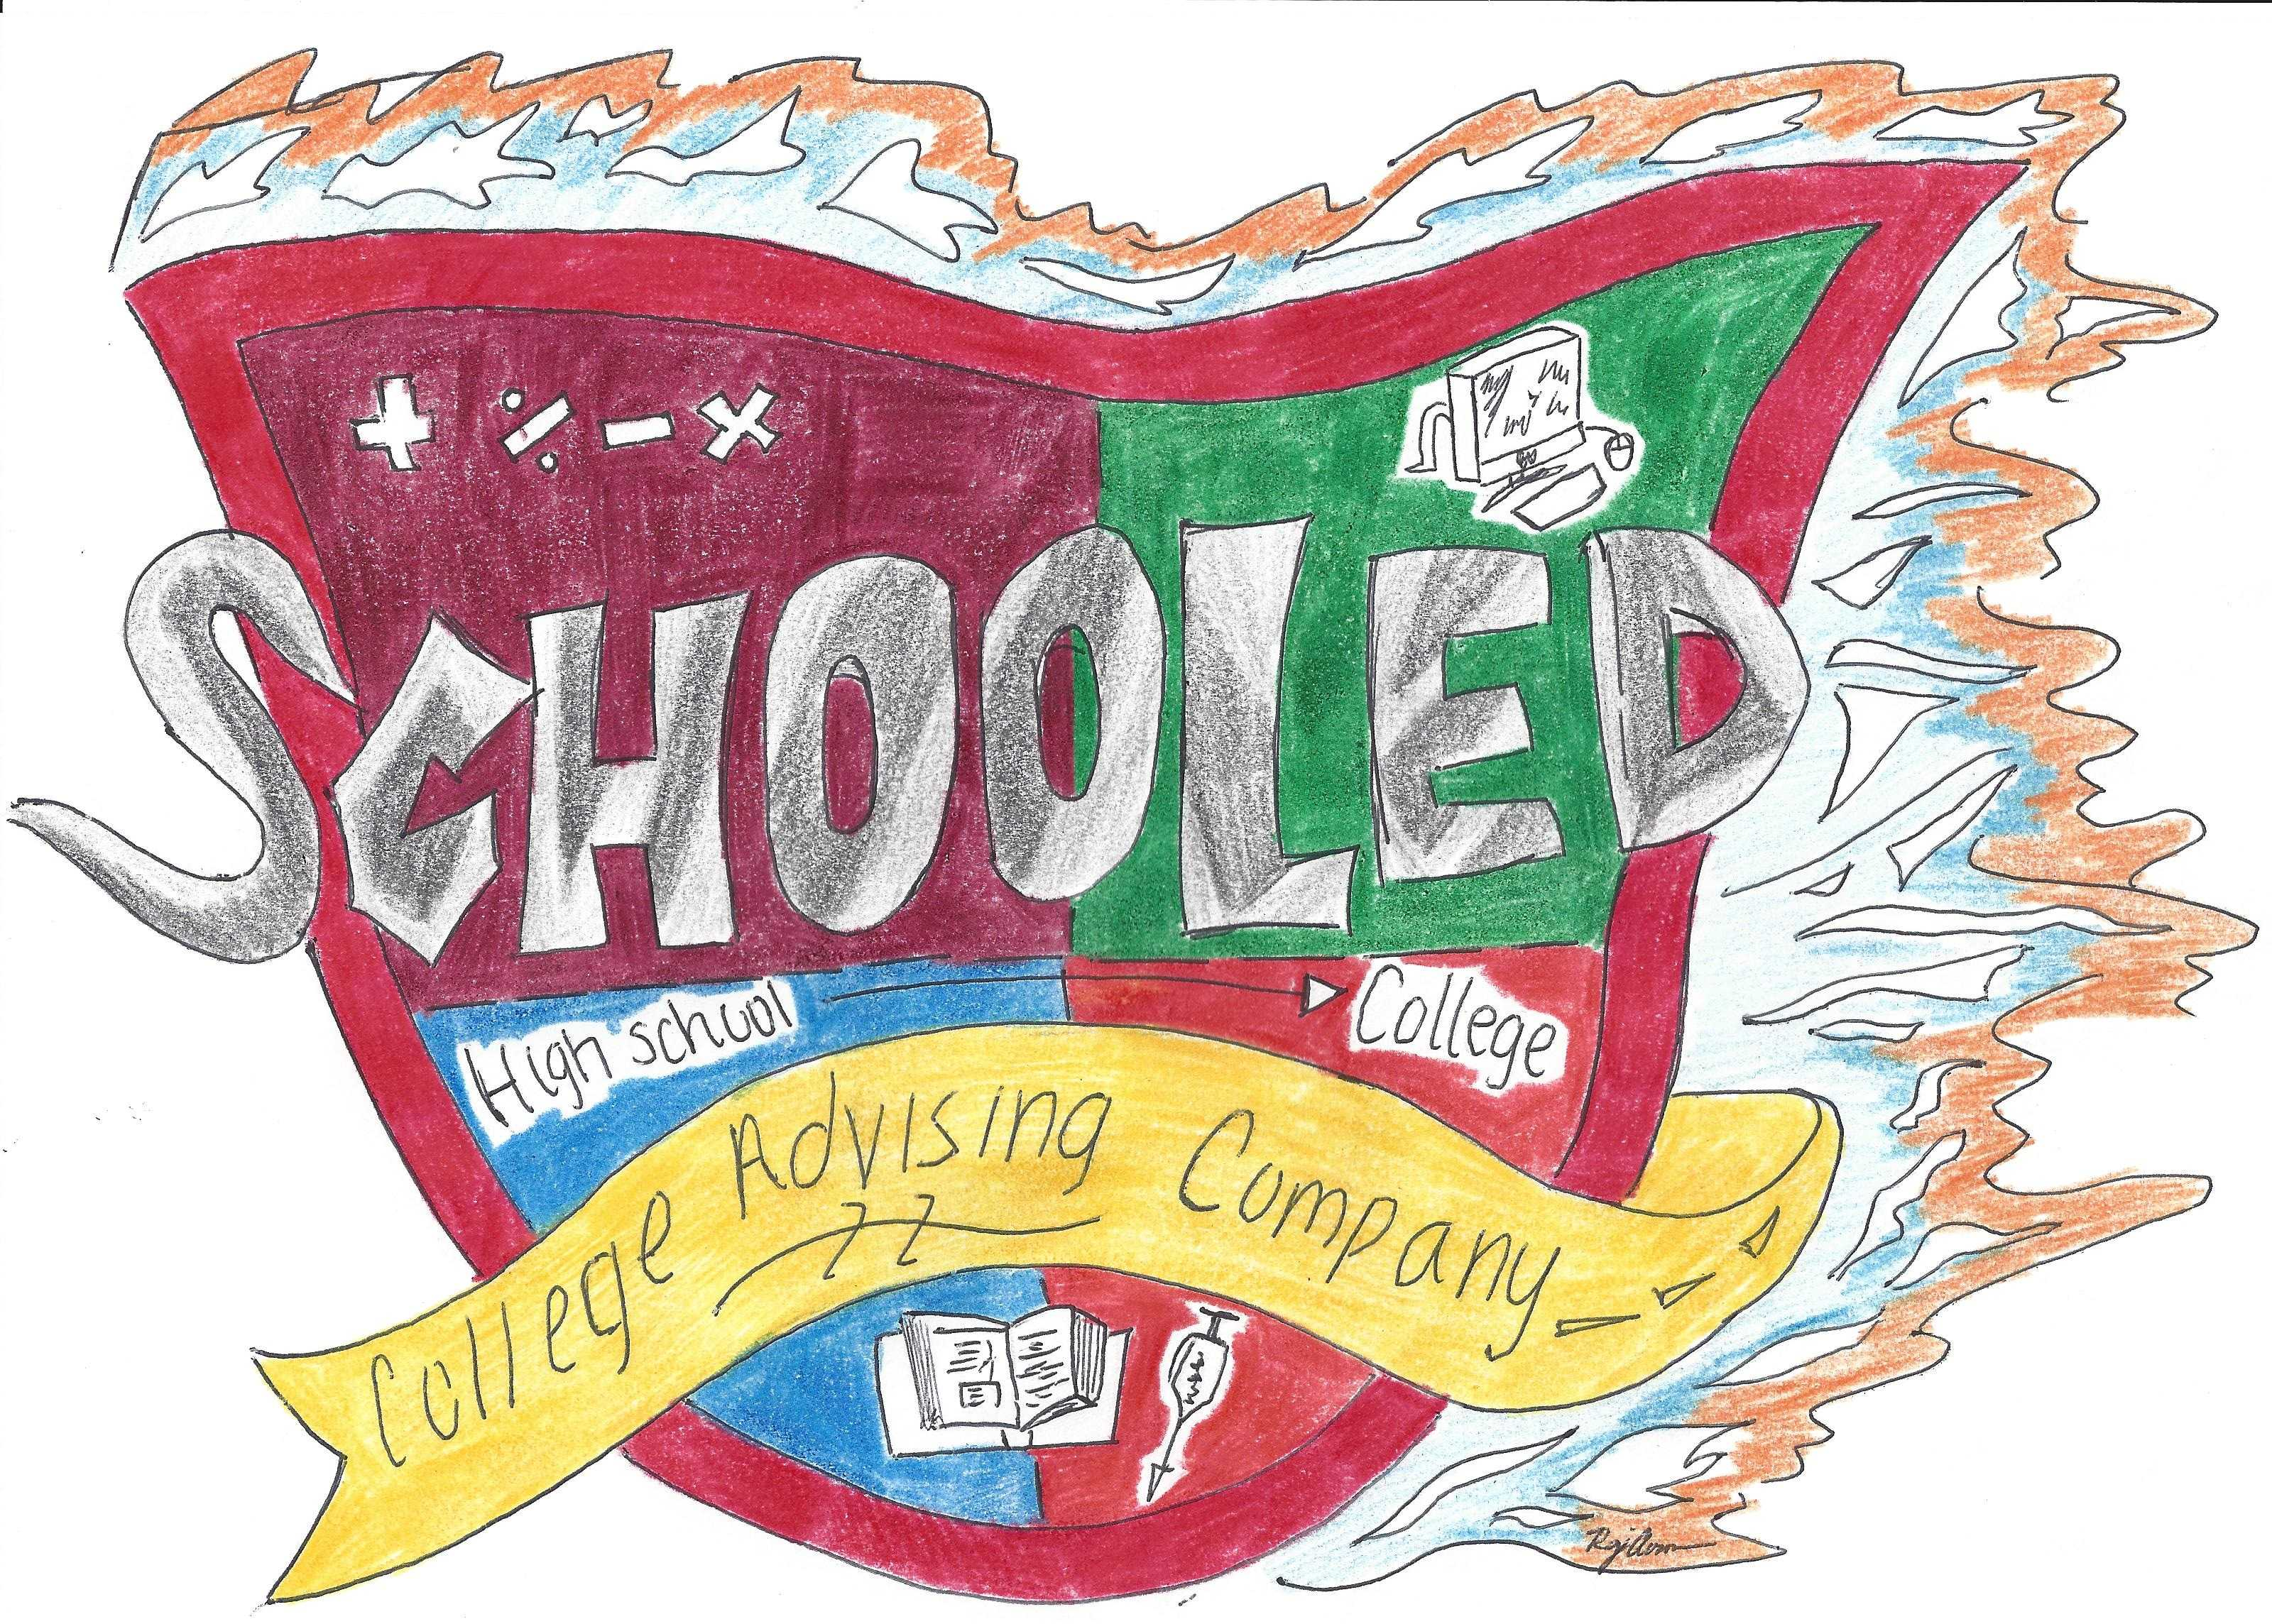 The logo for Schooled Prep. Photo from schooledprep.com.